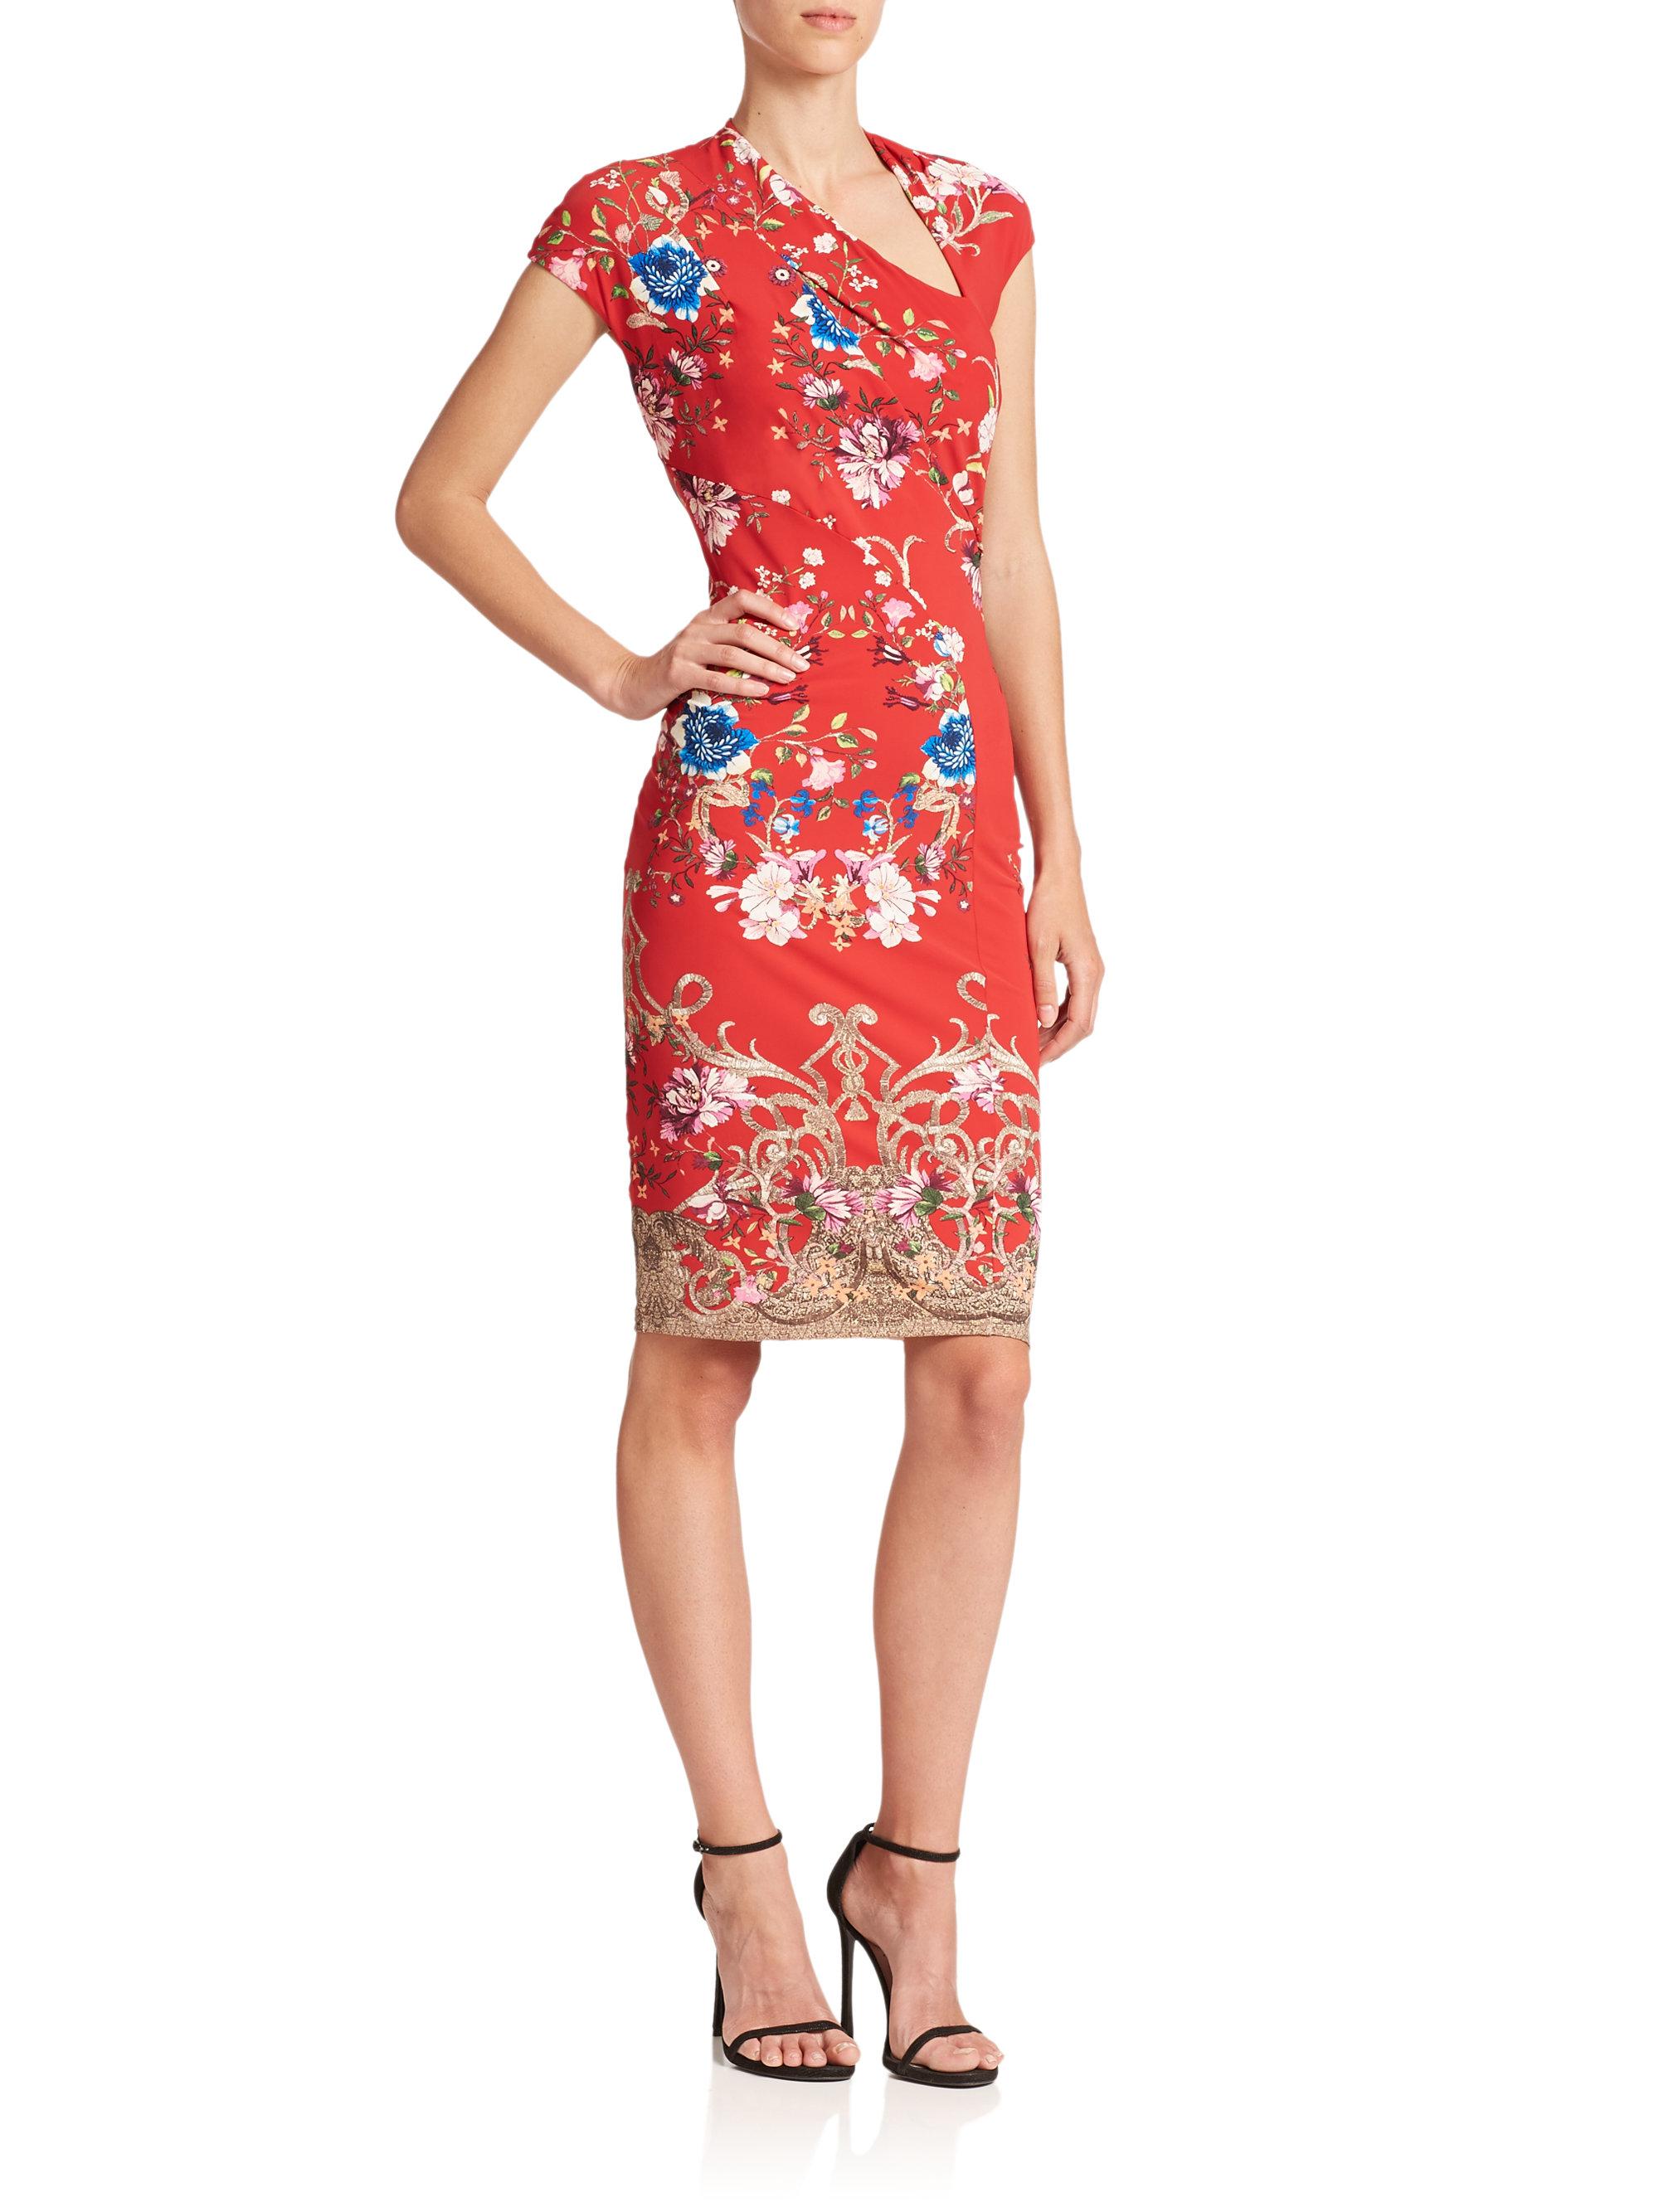 Lyst Roberto Cavalli Diagonal Floral Print Cap Sleeve Dress In Red